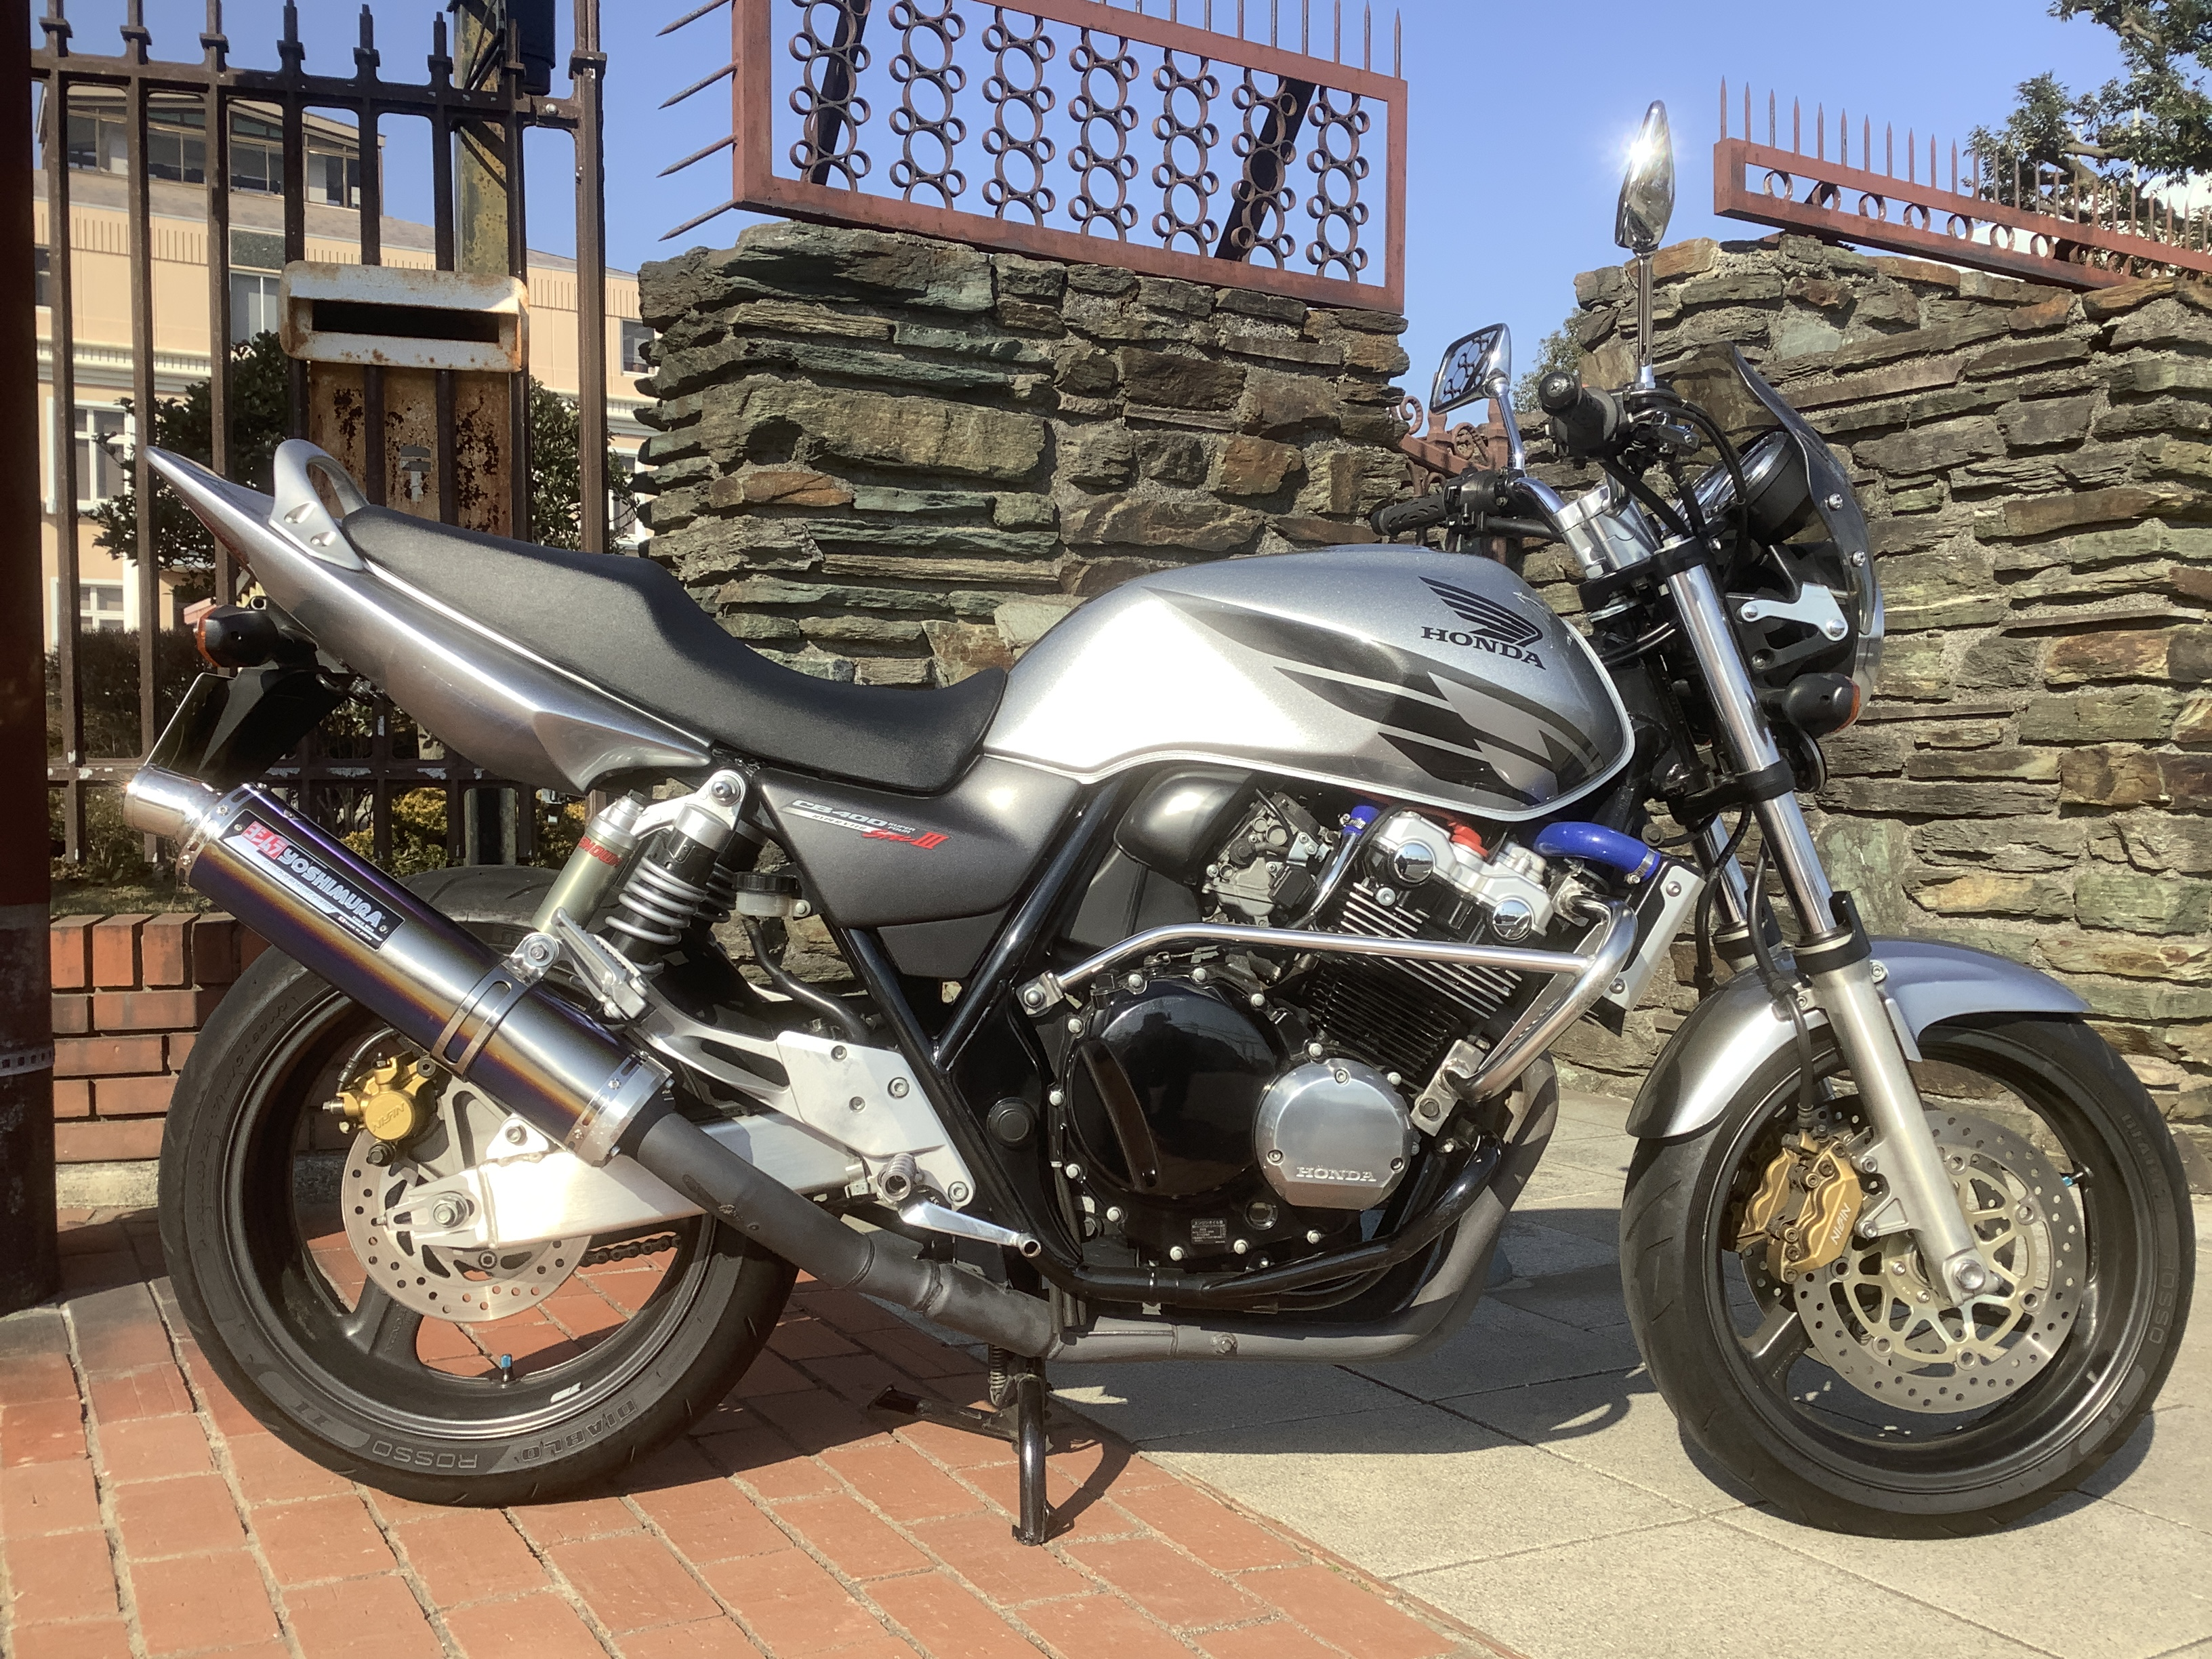 CB400Vtec-3(HN-00)銀 - 【公式】レンタルバイクのベストBike® 小田原駅前